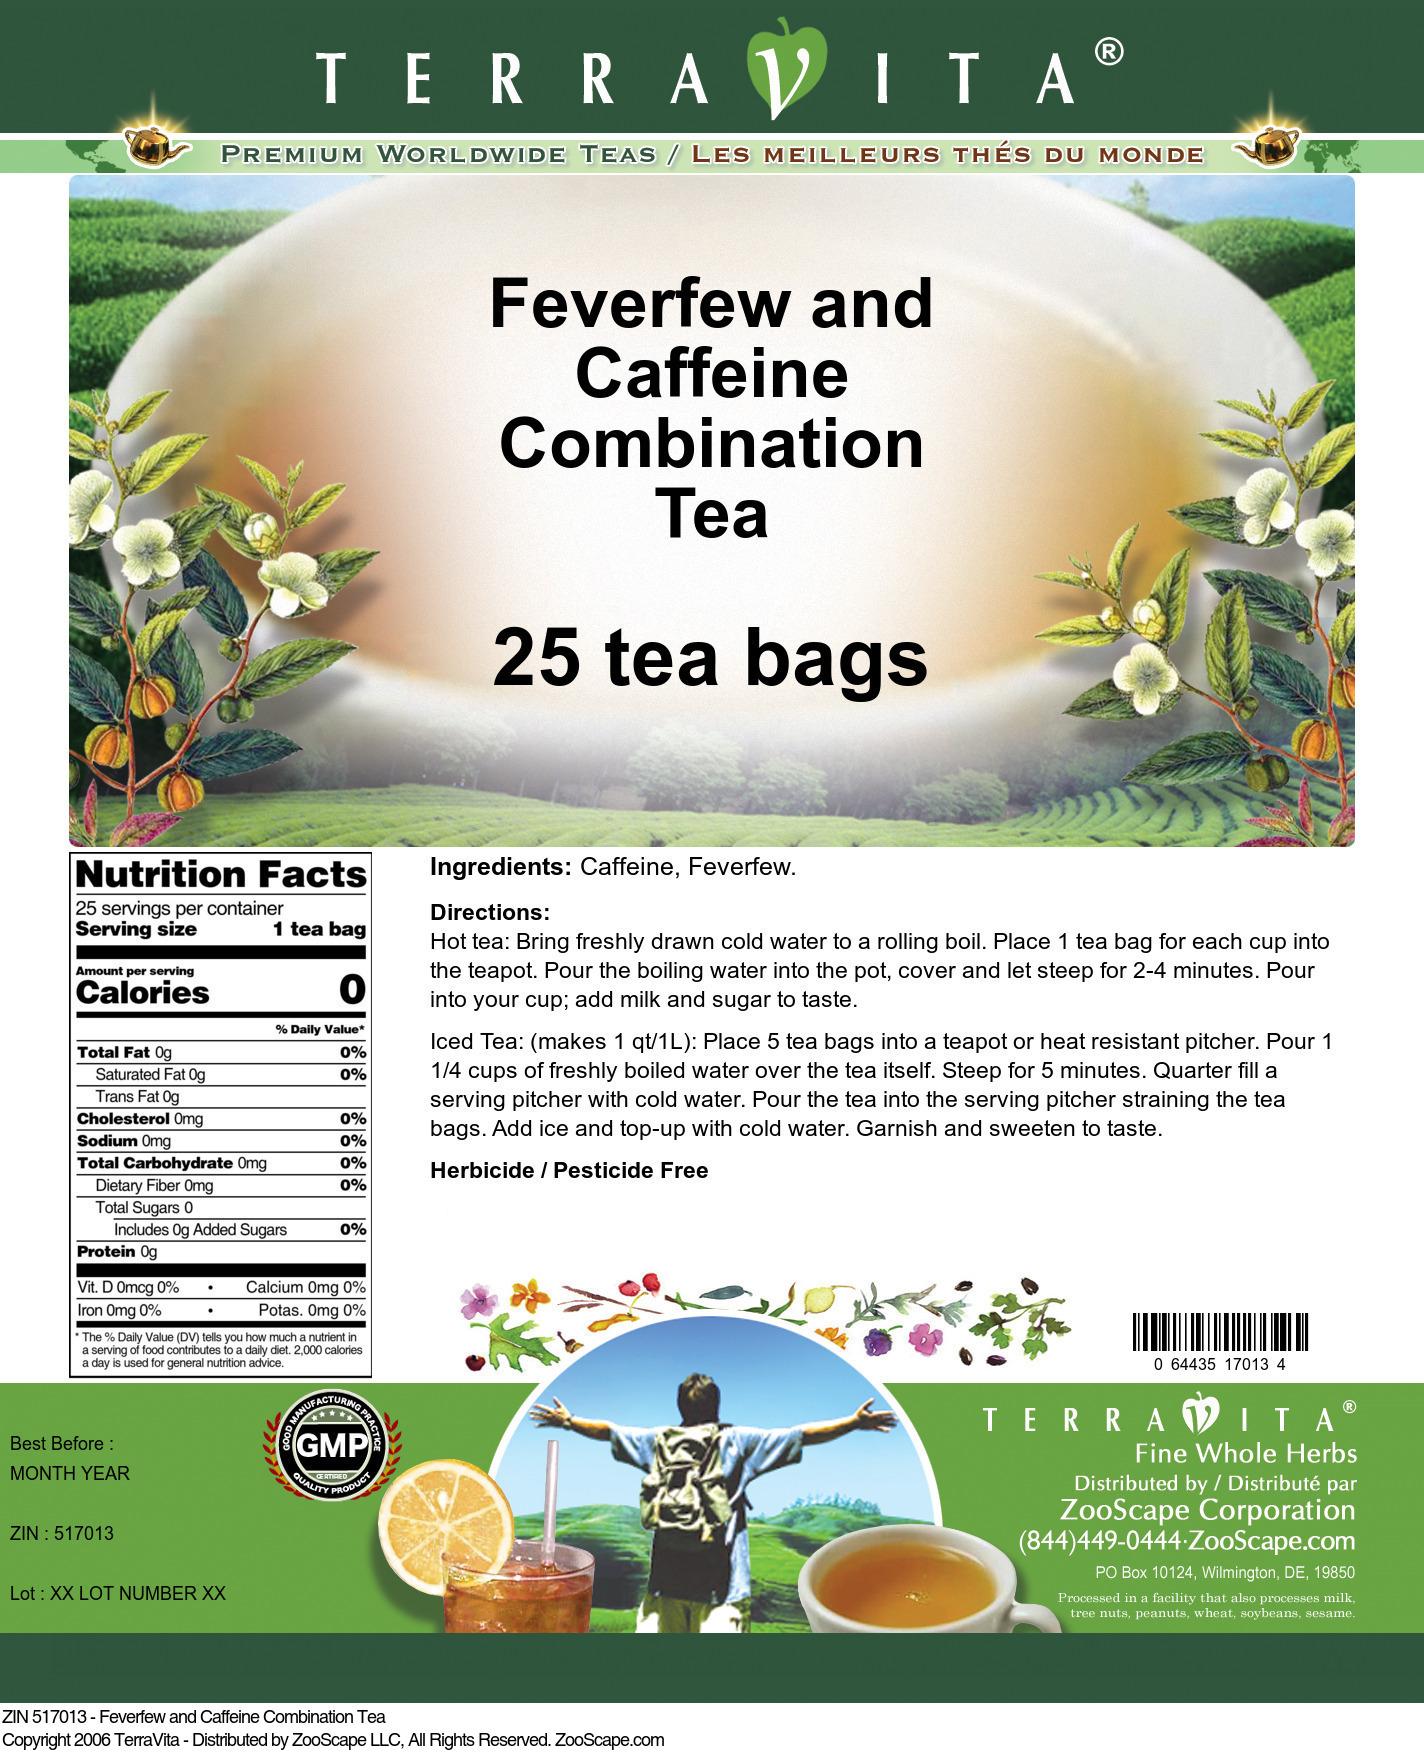 Feverfew and Caffeine Combination Tea